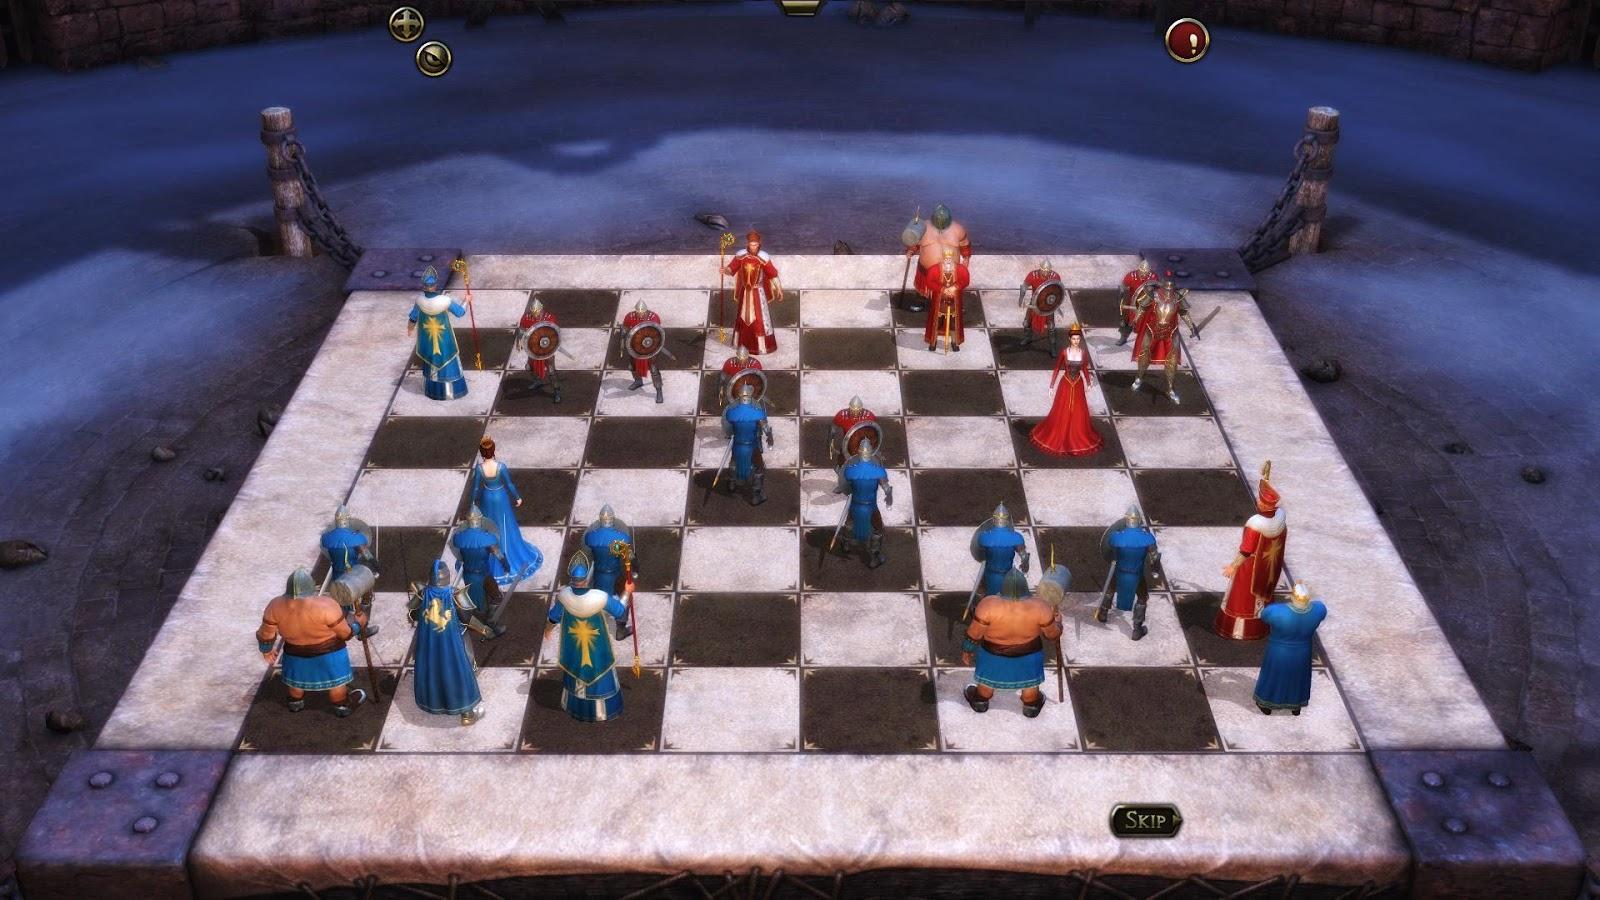 Battle chess game of kings 2015 full version pc game for Battle chess